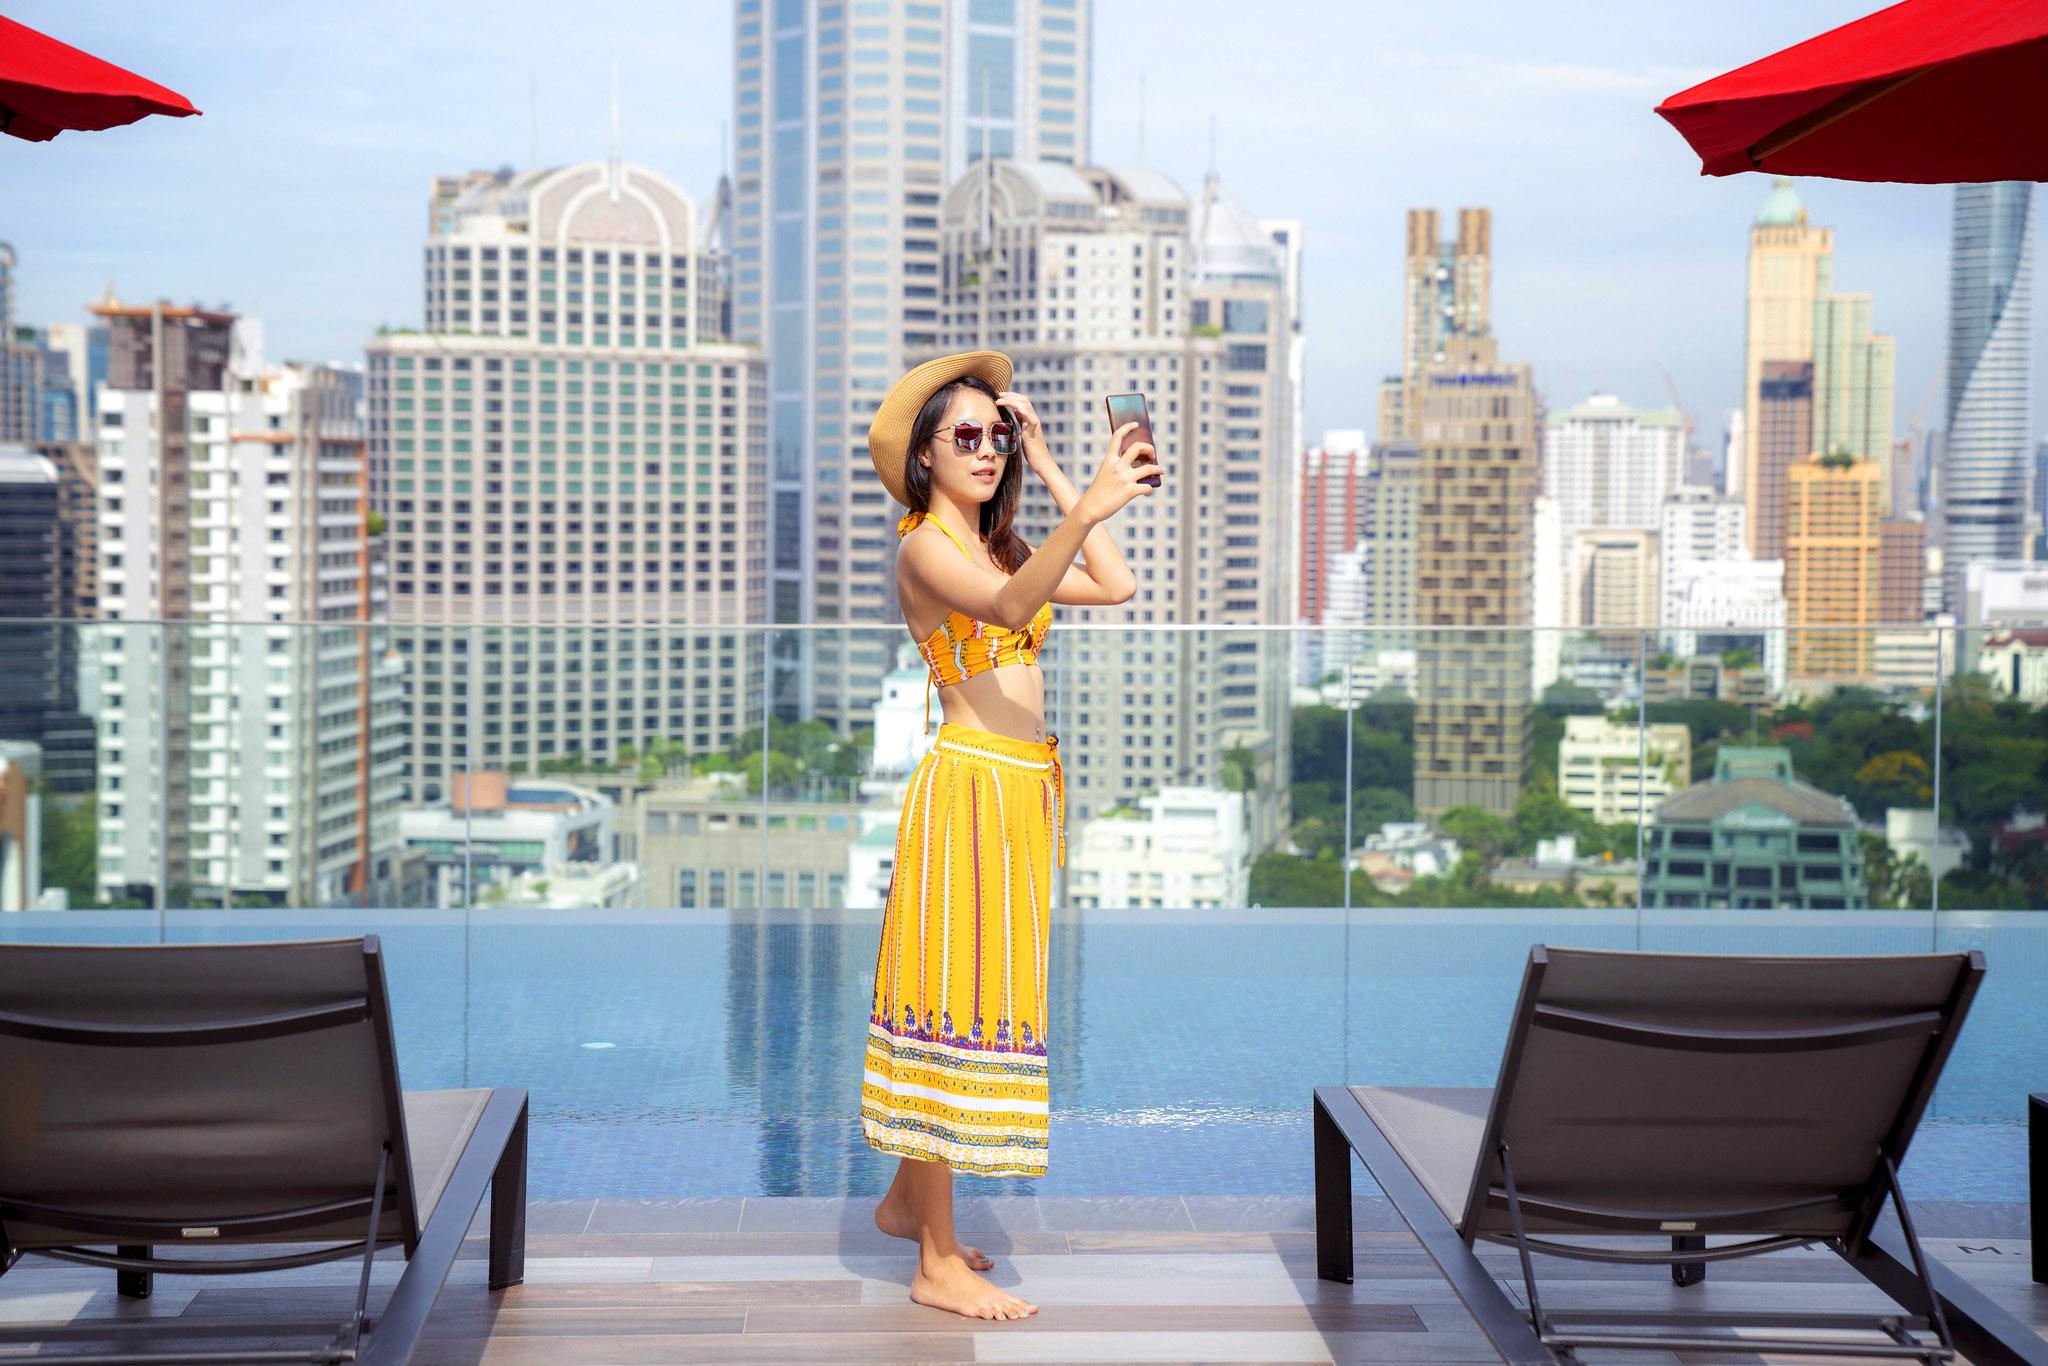 Rooftop Bangkok by Anek Suwannaphoom.jpg